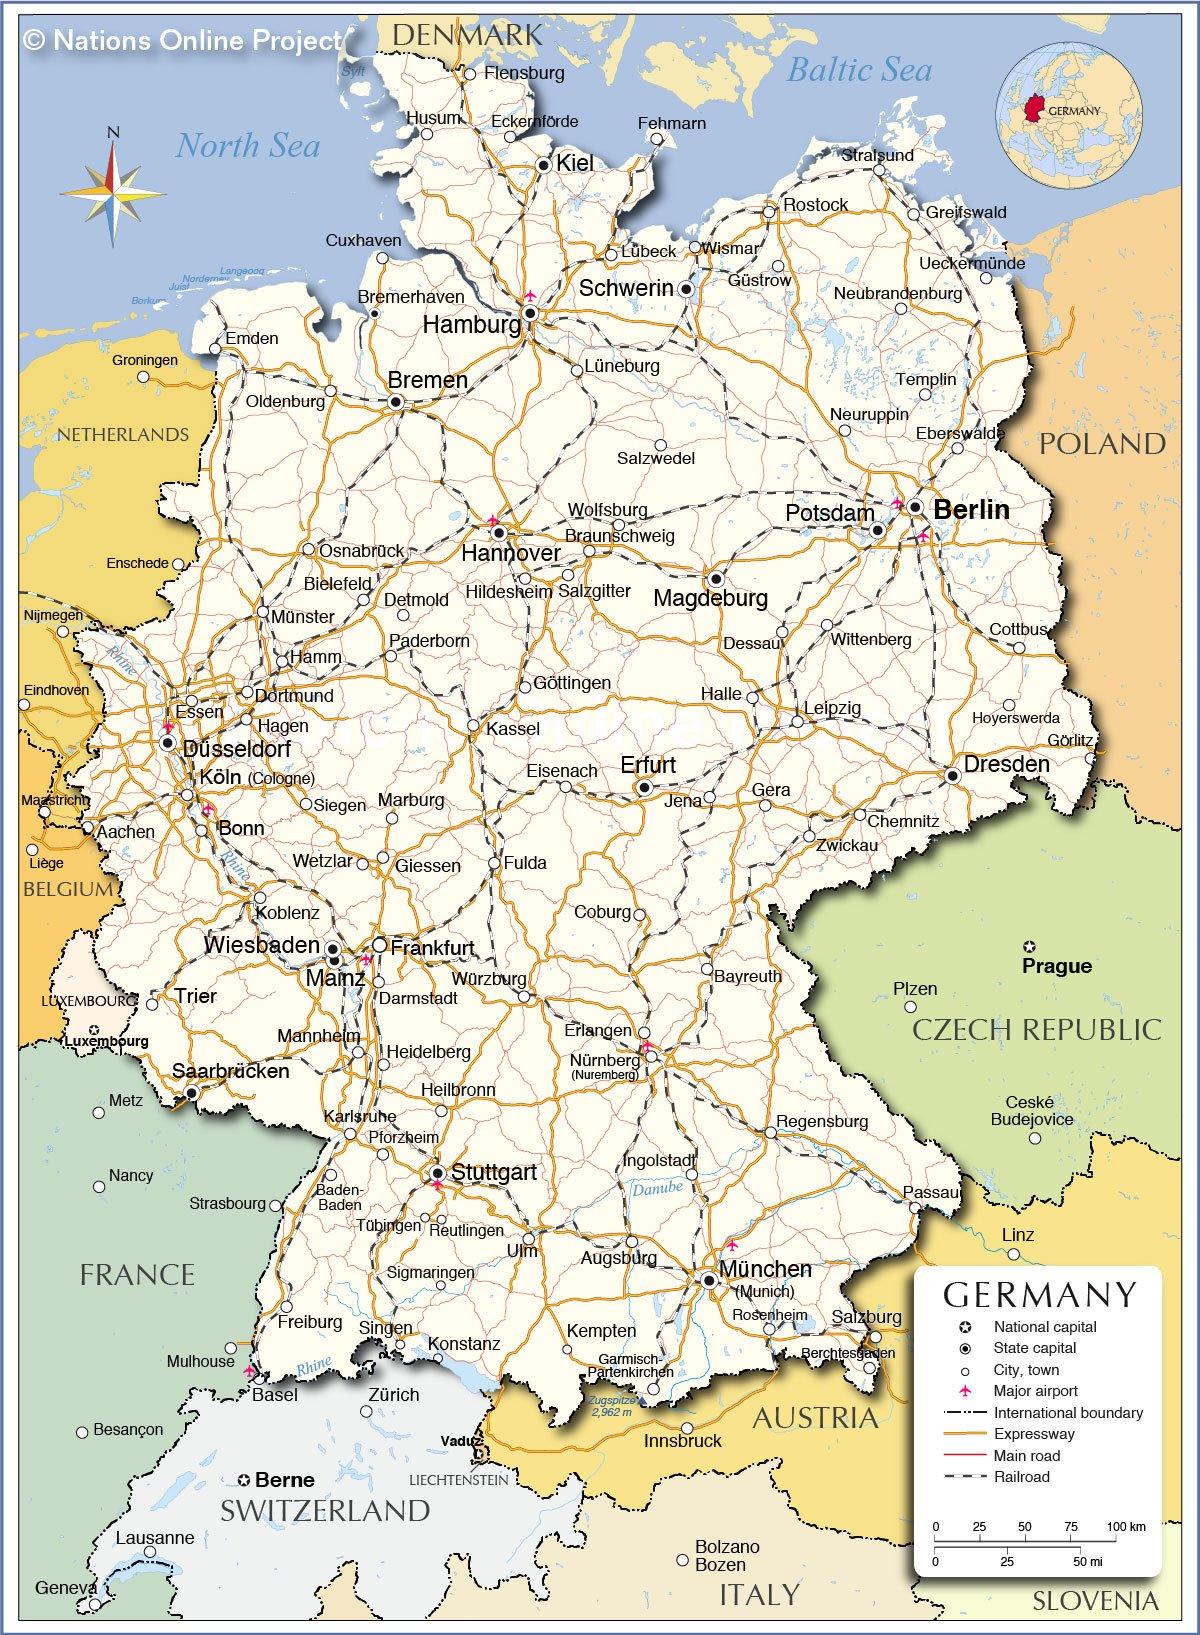 germany-political-map.jpg